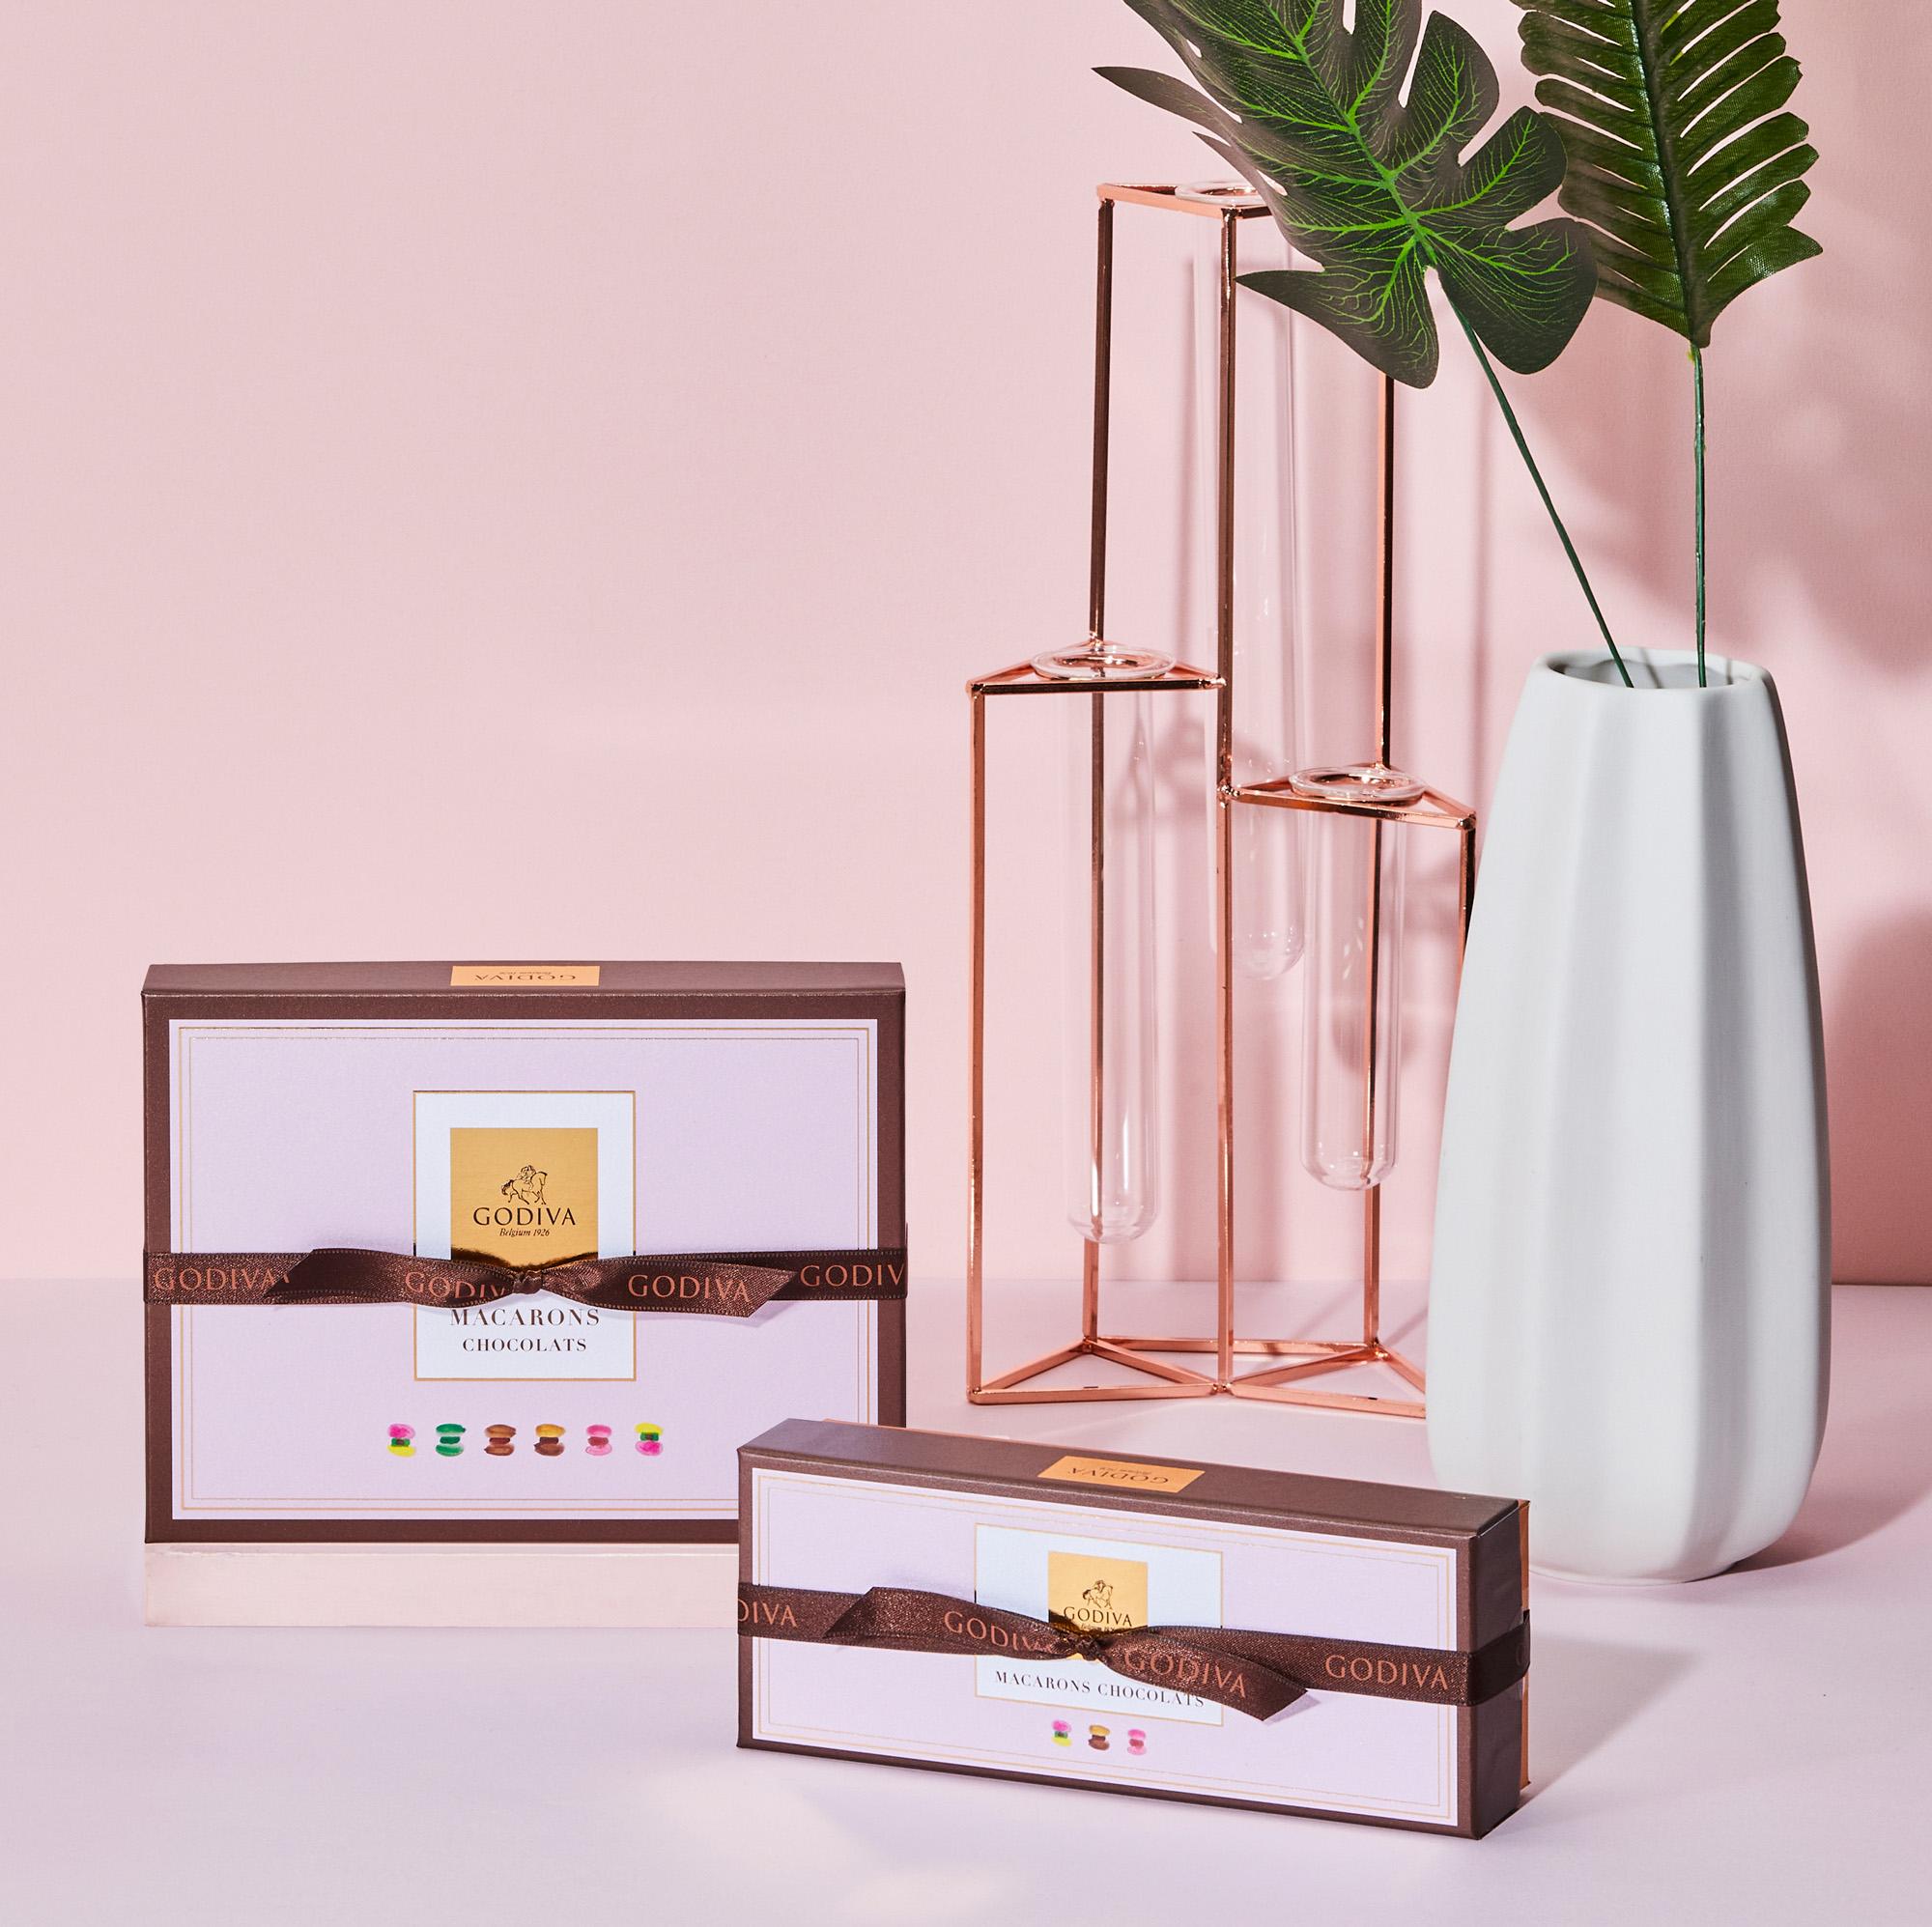 GODIVA ホワイトデー コレクション 2020 マカロンショコラパッケージ